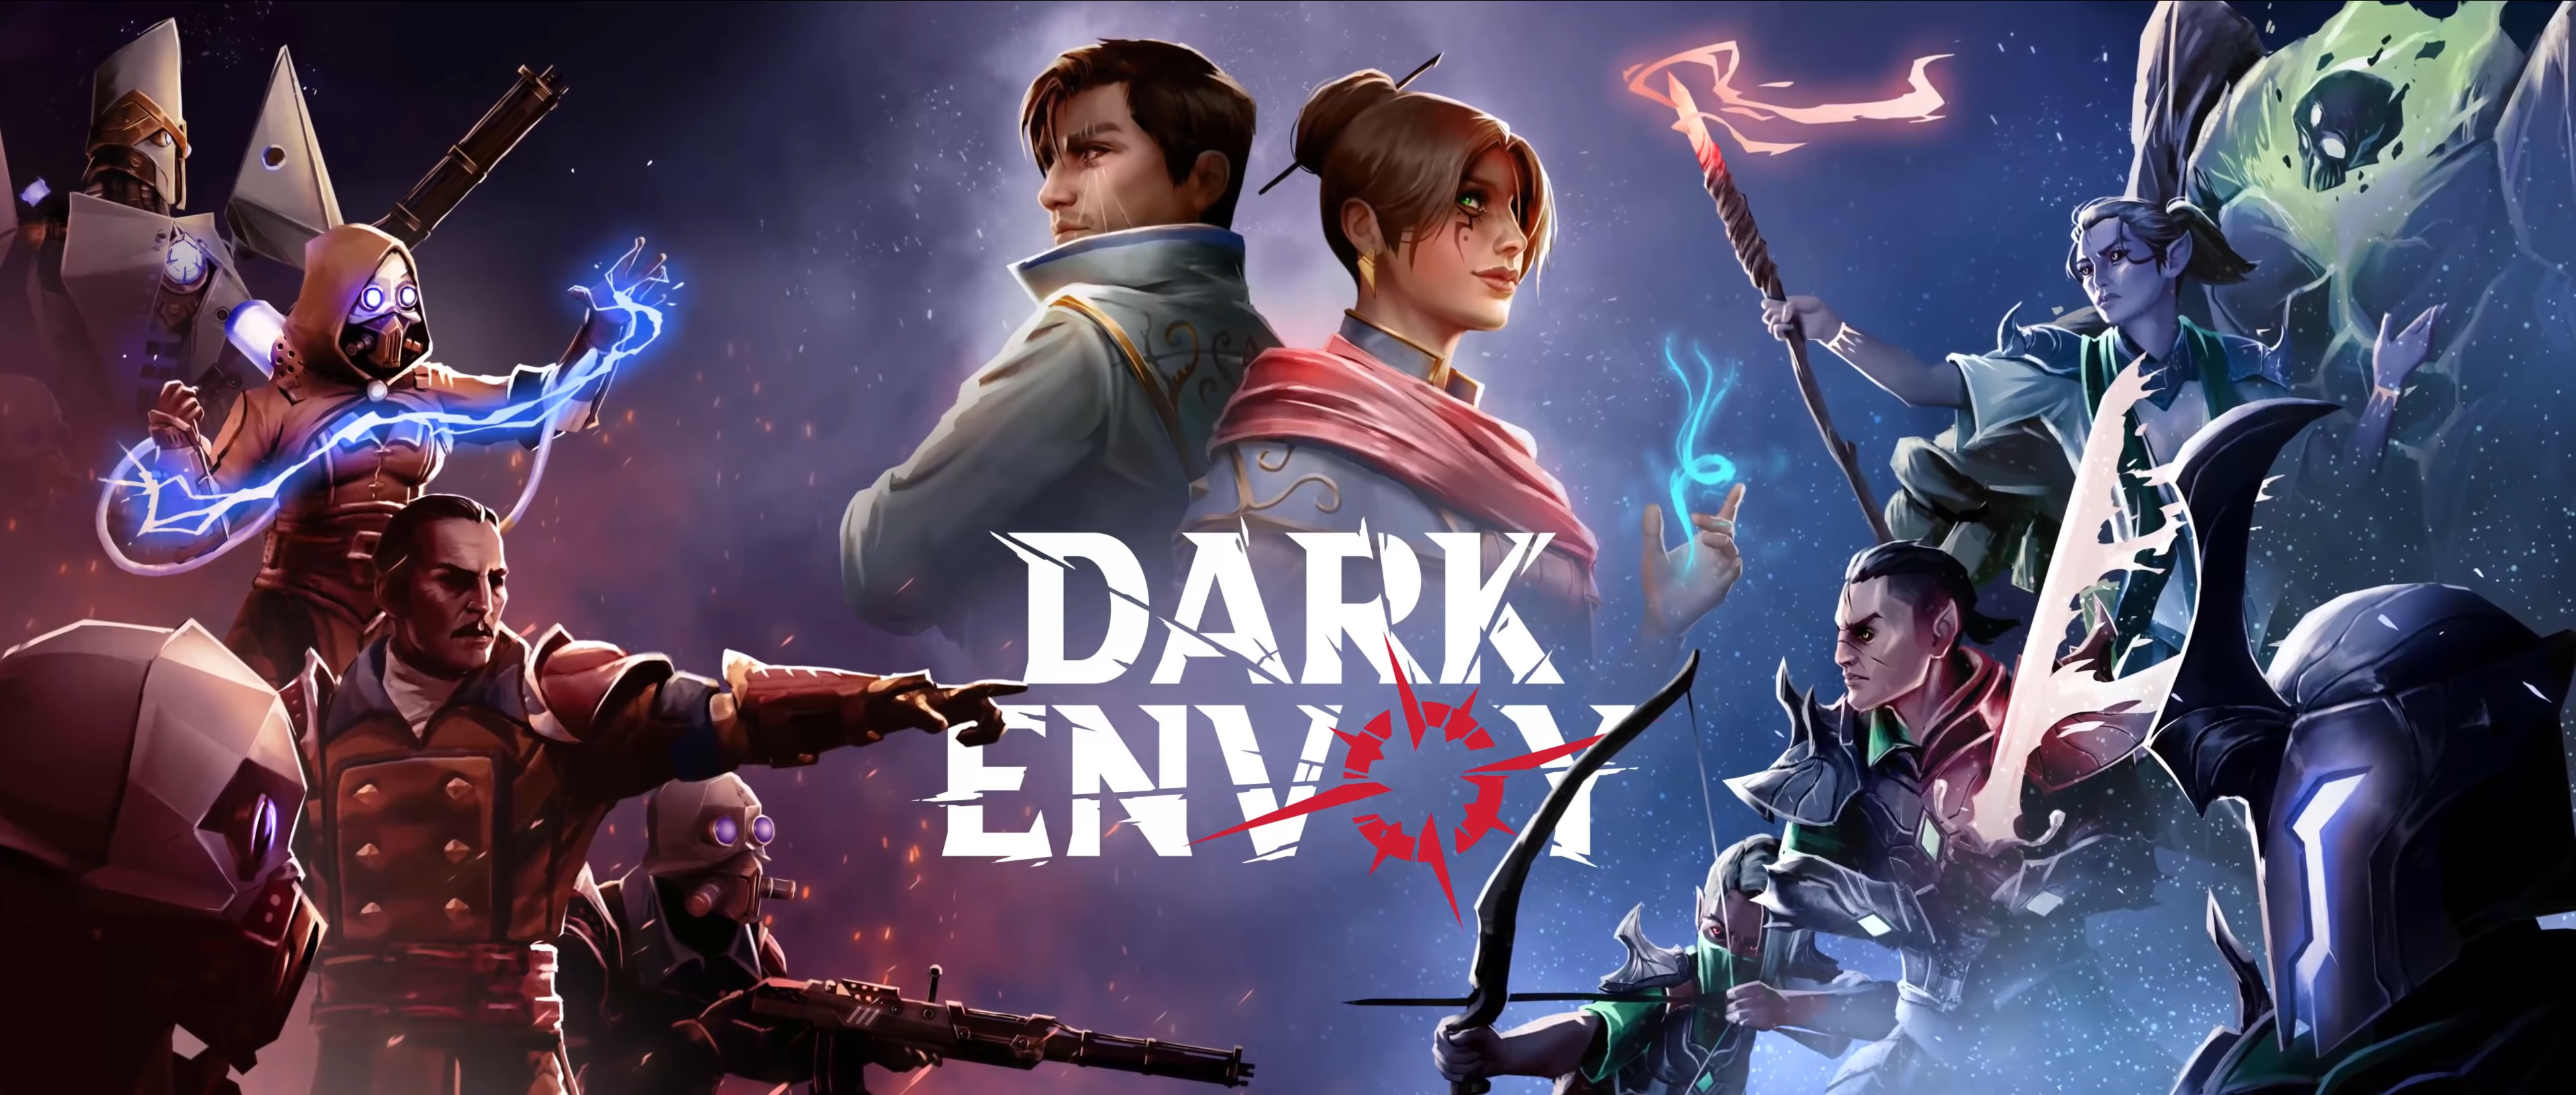 Please visit Steam to find out more about Dark Envoy: https://store.steampowered.com/app/945770/Dark_Envoy/